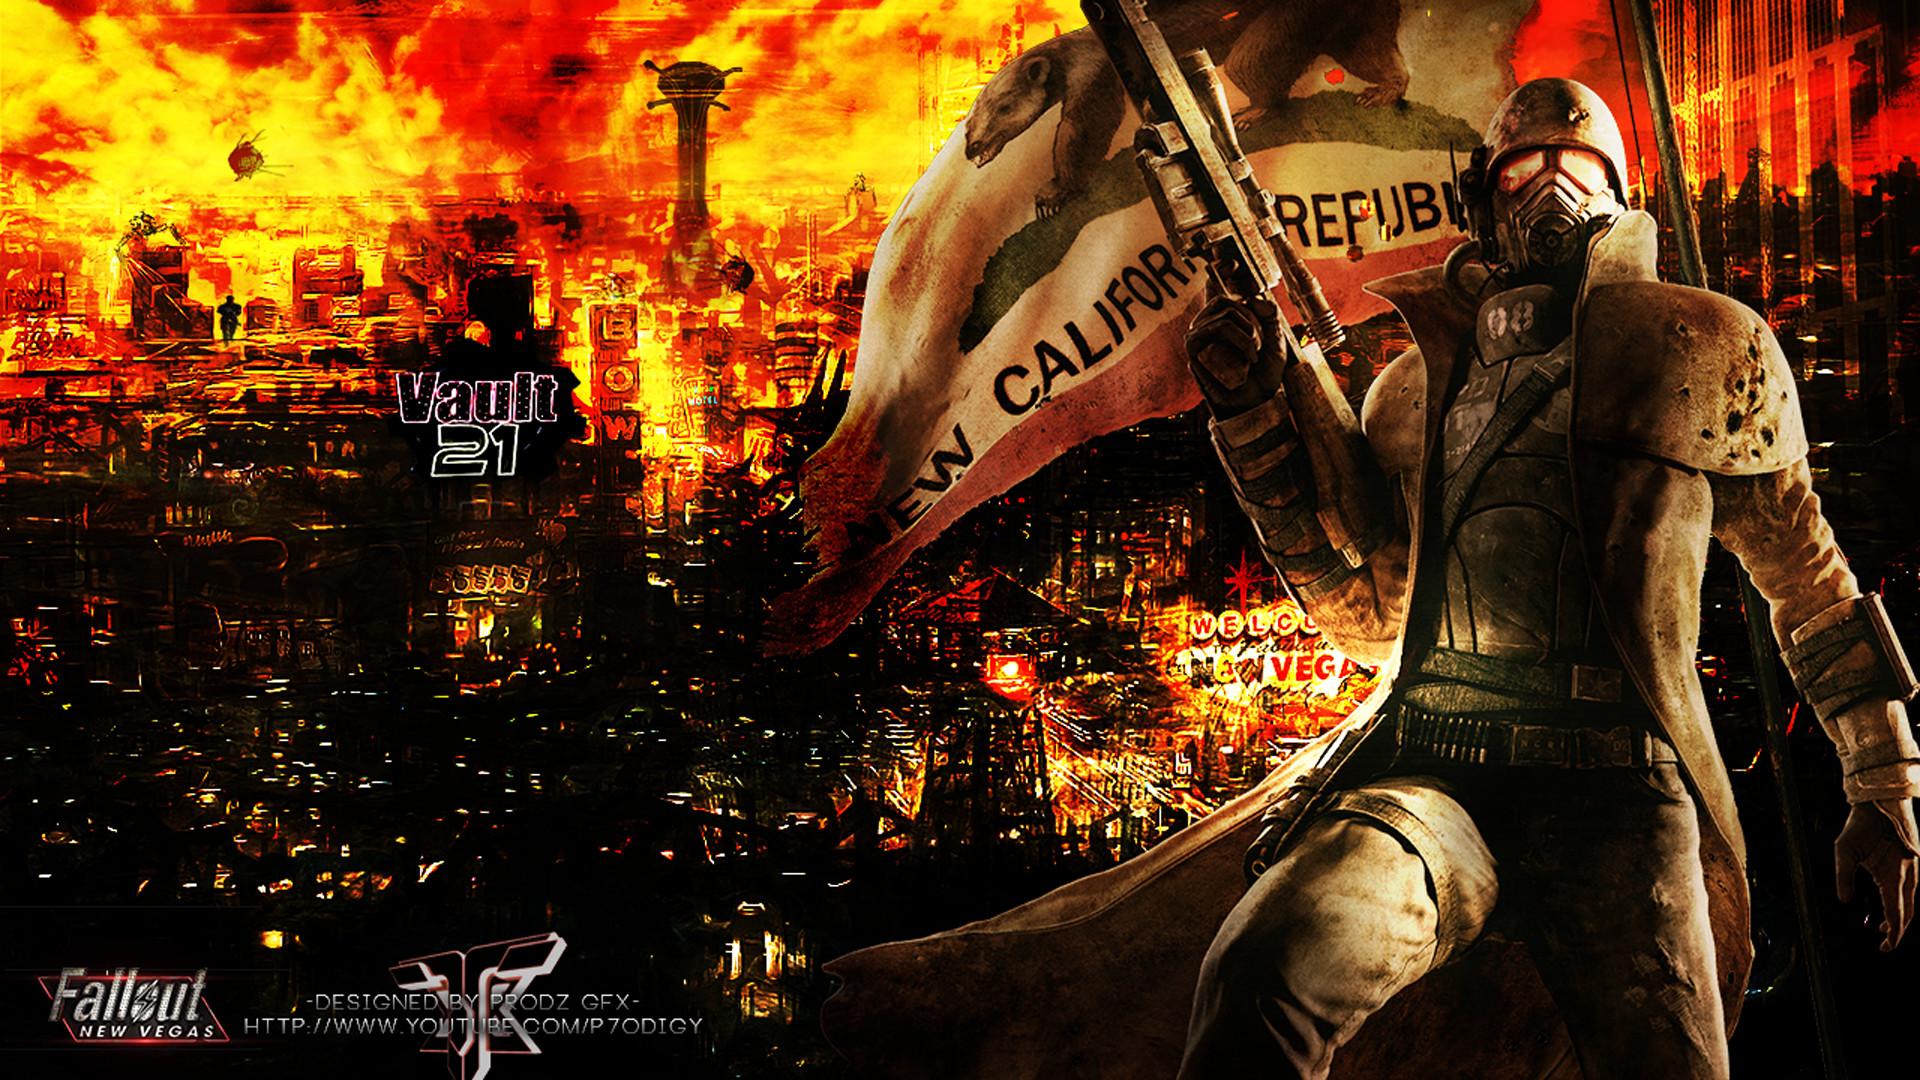 Fallout New Vegas Wallpaper Hd. Fallout New Vegas Desktop Background  HDby imProDzGFX